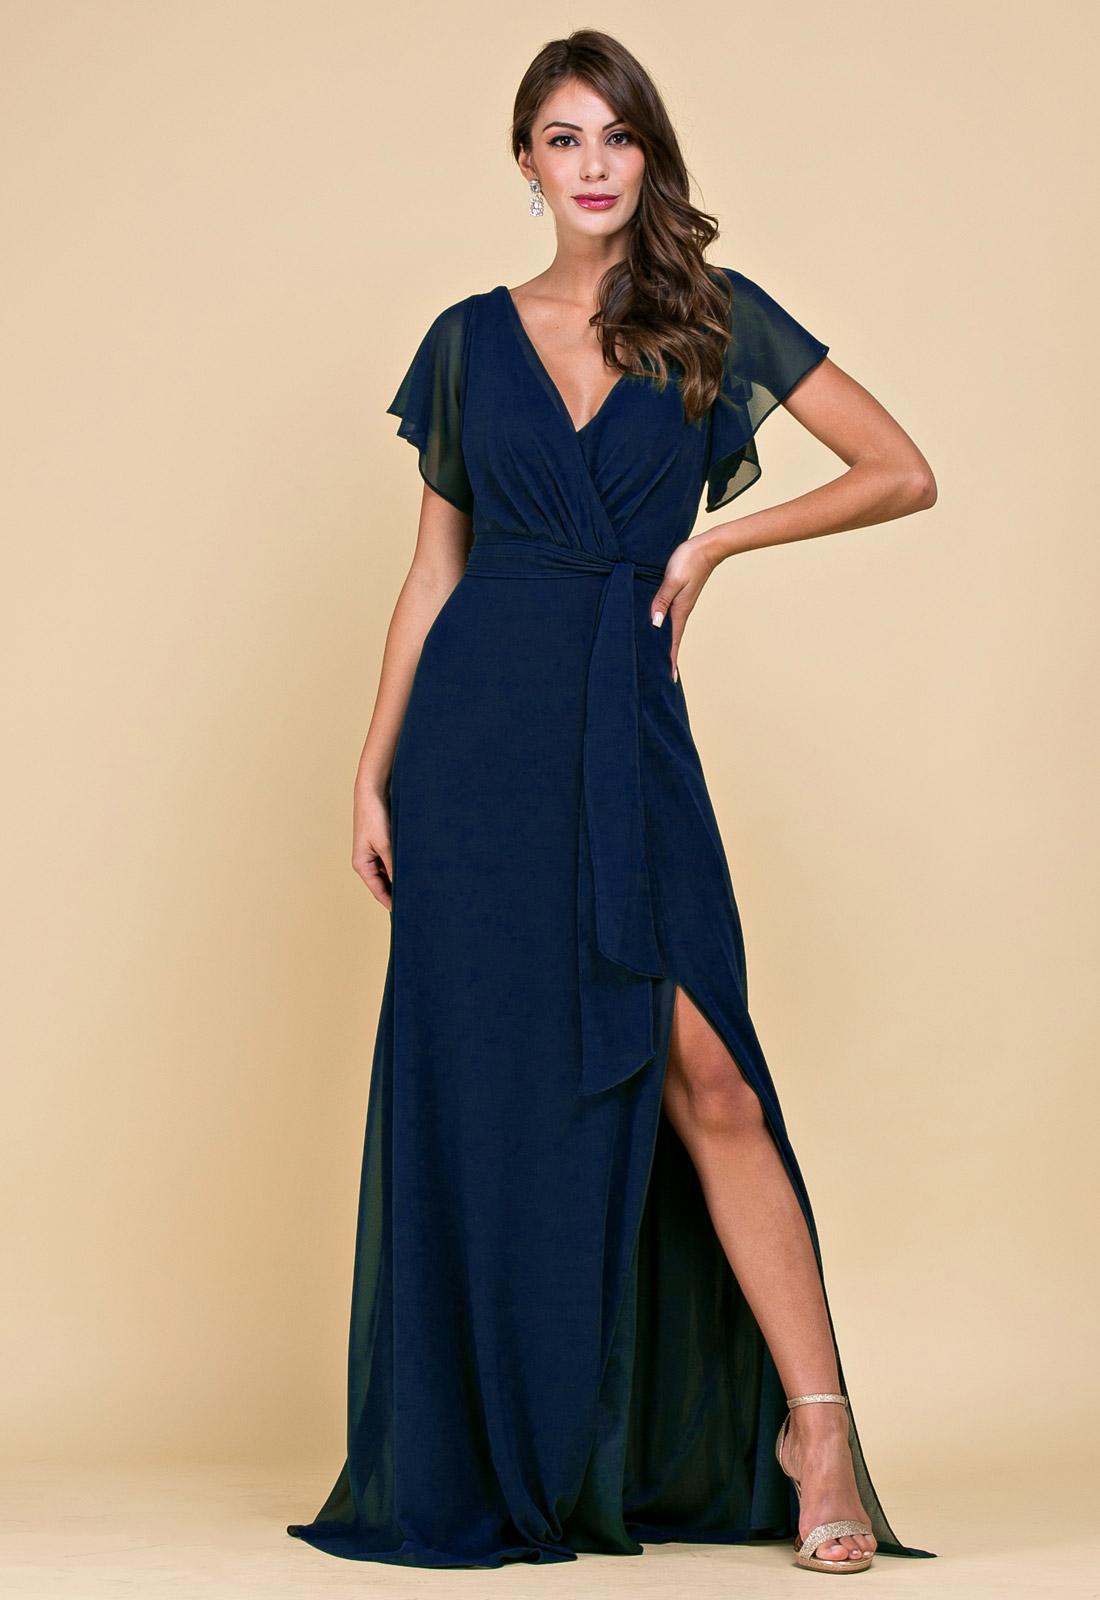 Vestido de festa longo marinho - Ref. 2541